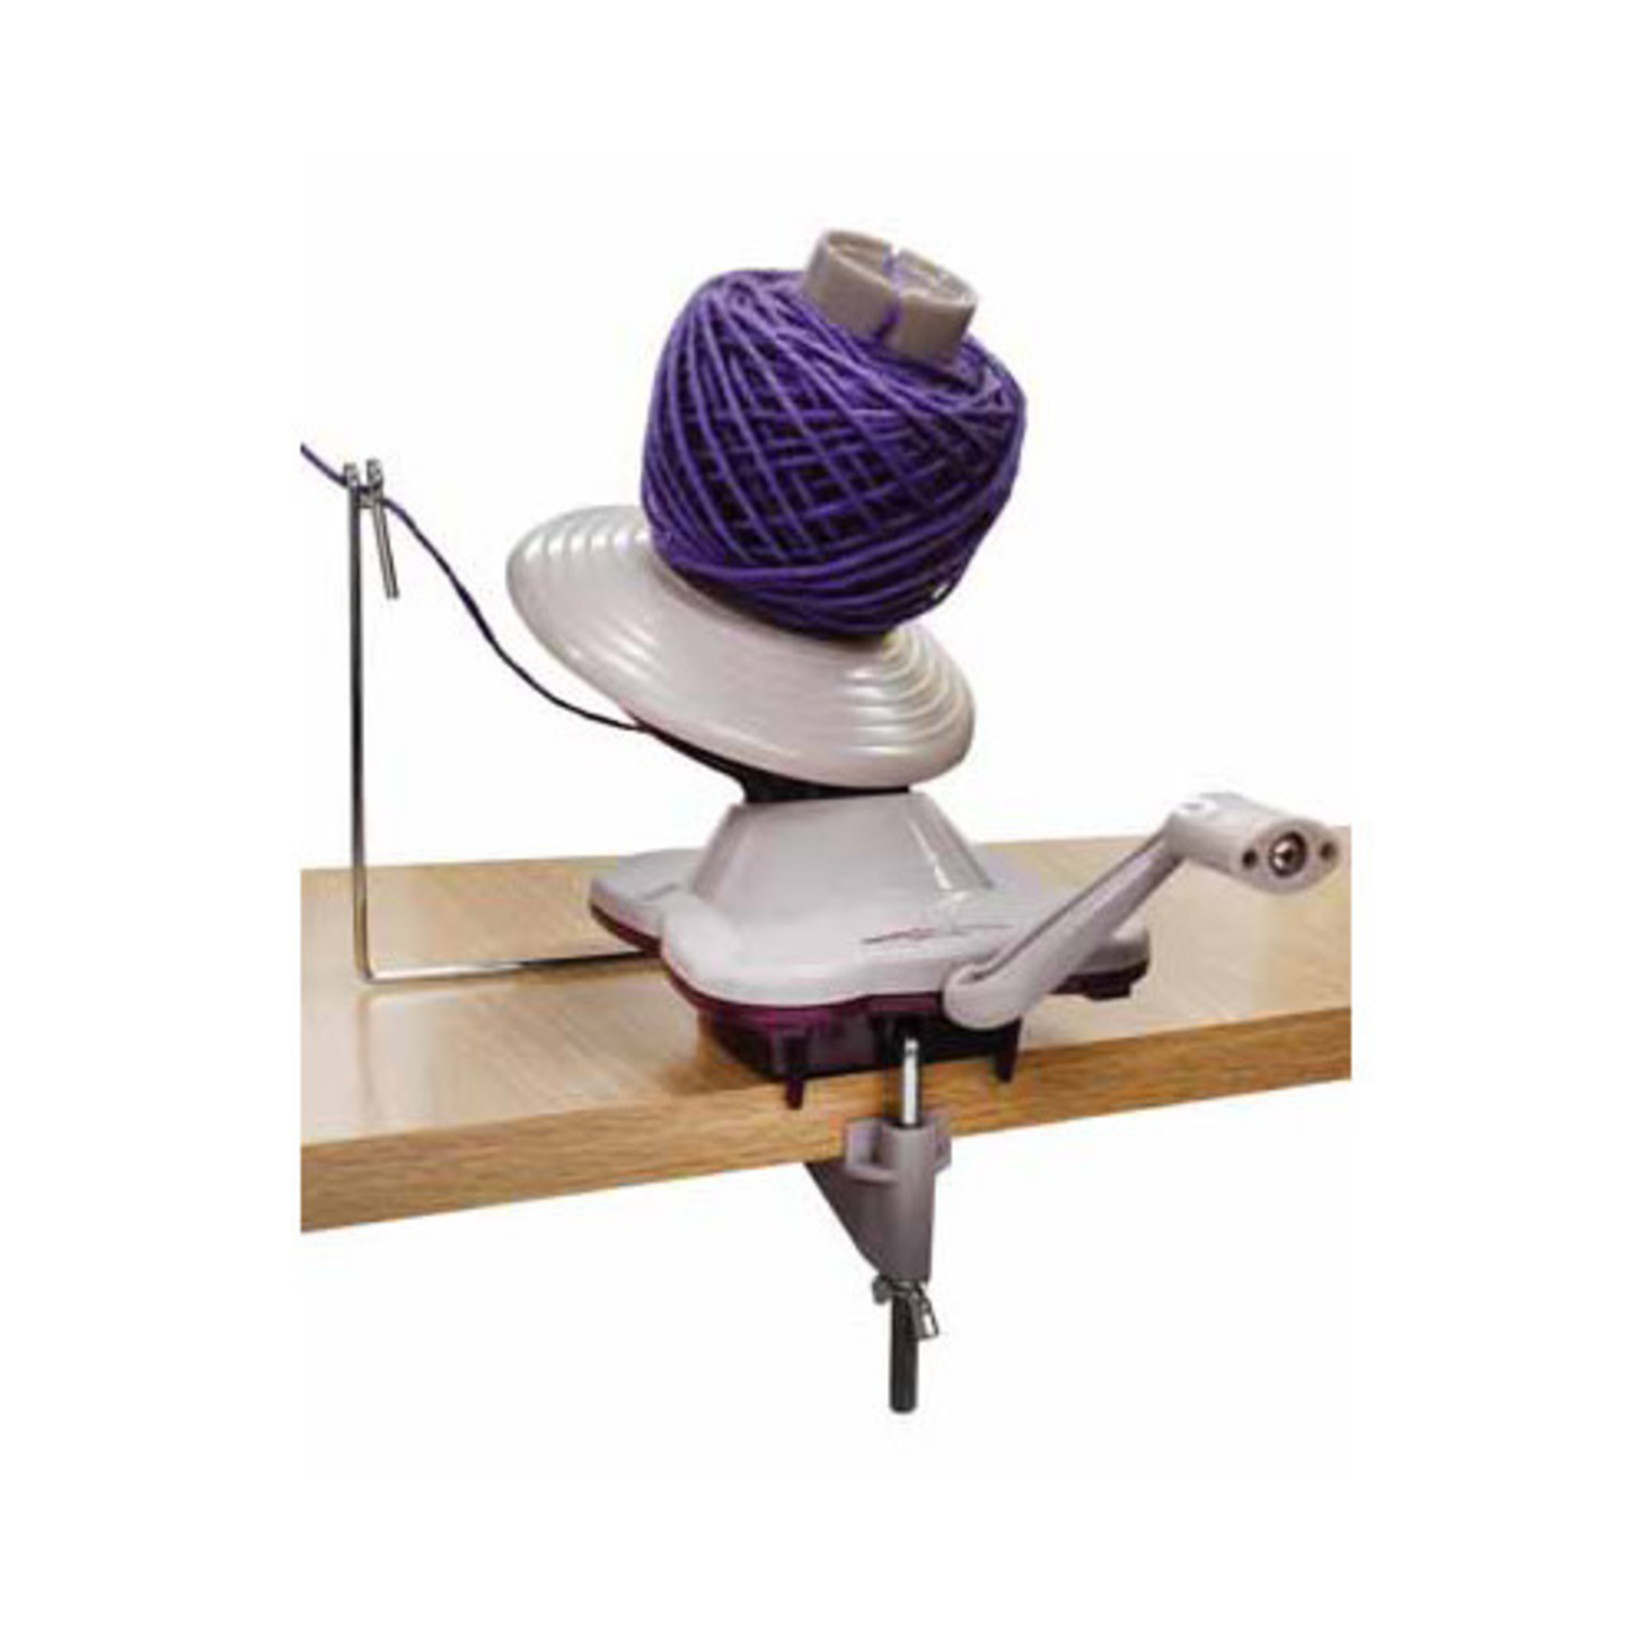 Knit Picks Ball Winder by Knit Picks